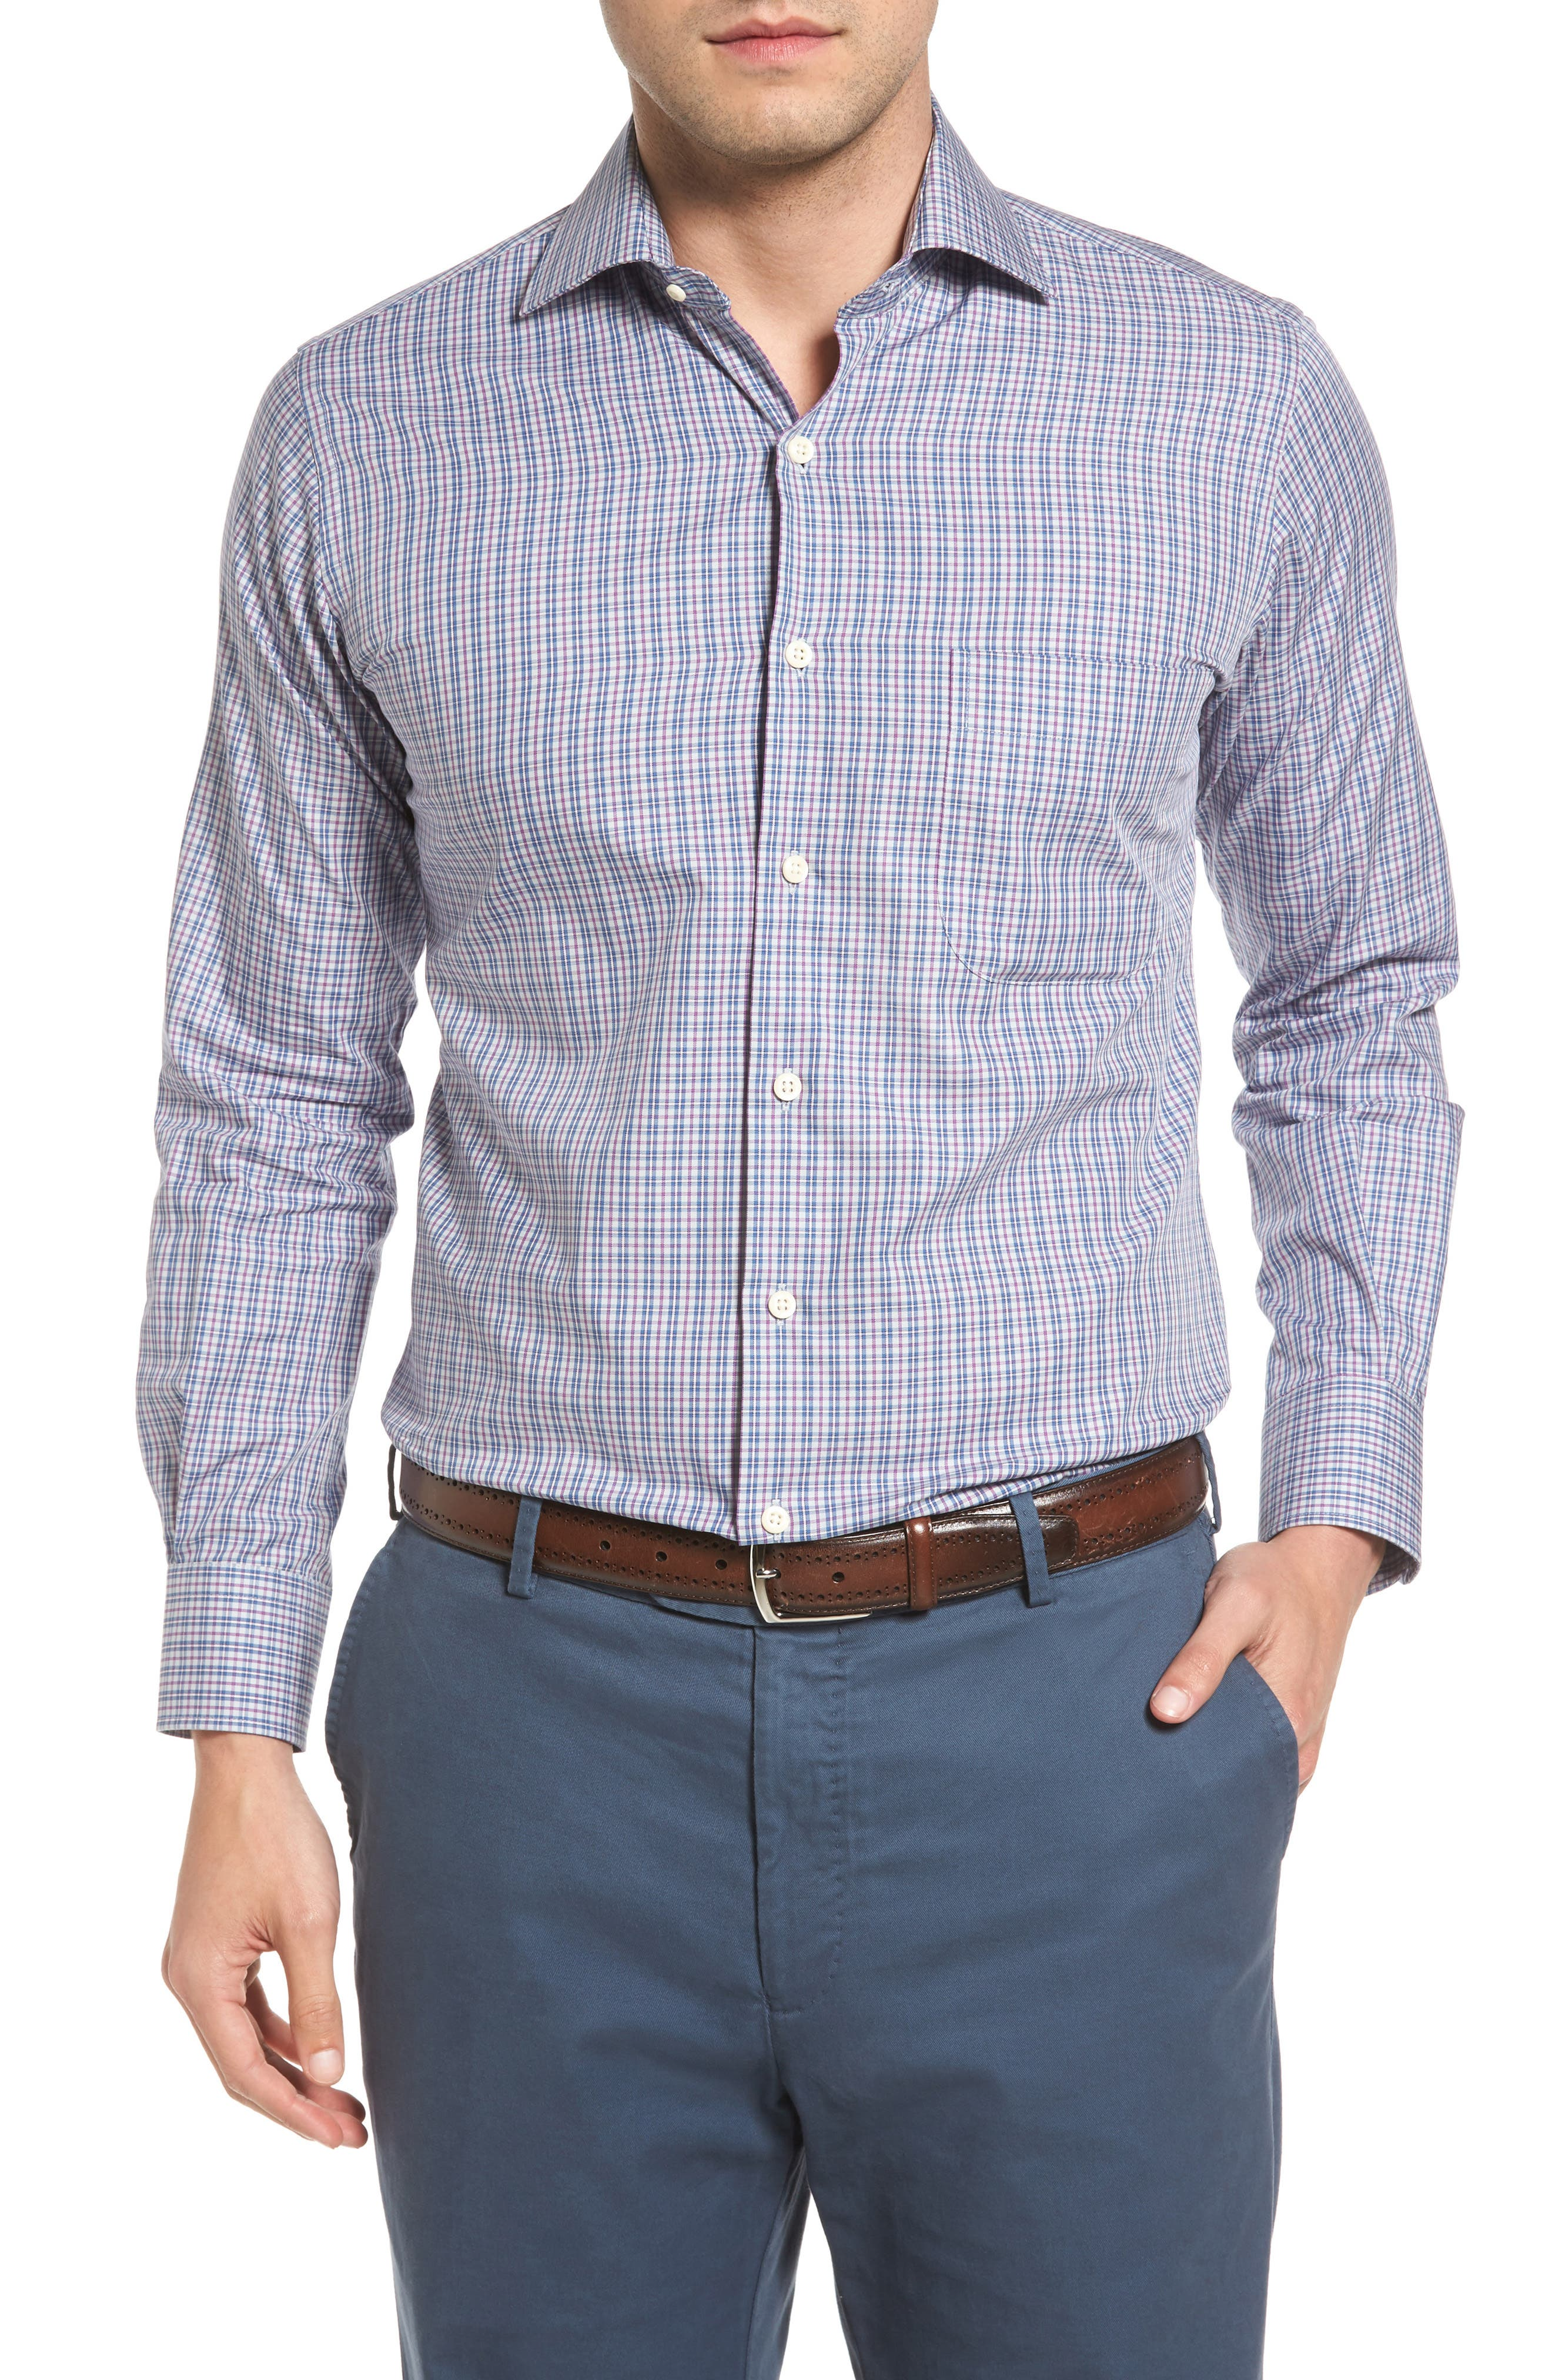 Alternate Image 1 Selected - Peter Millar Hillock Plaid Regular Fit Sport Shirt